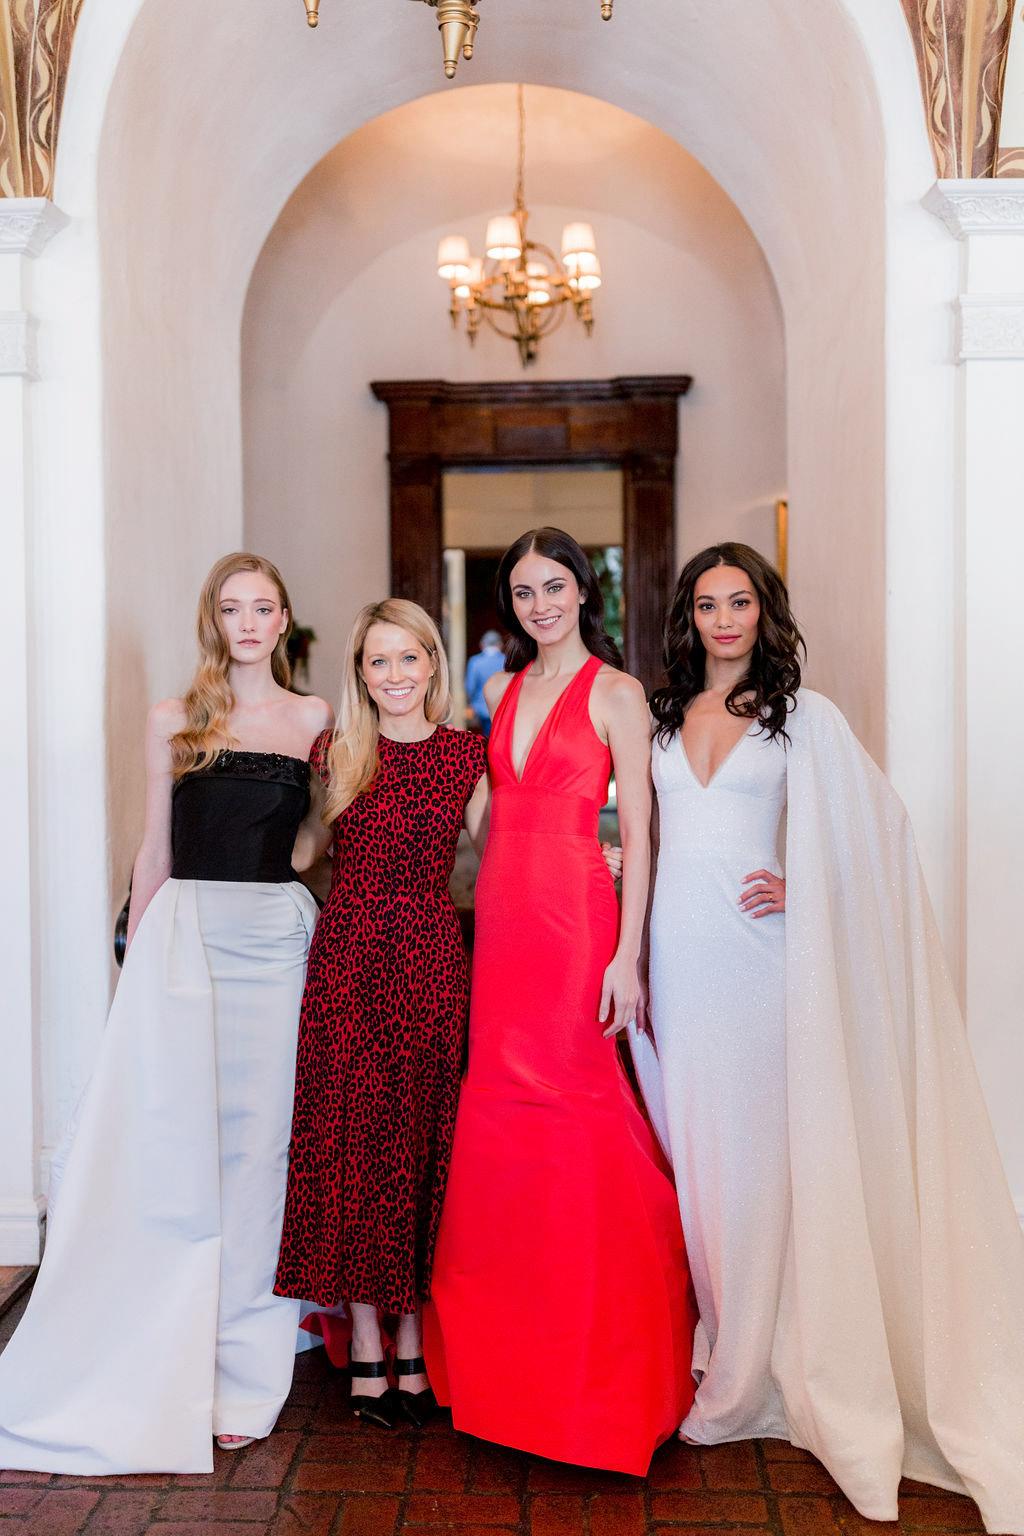 Fashion Designer Allison Webb at her Spring 2019 Bridal Fashion Event in LA, Photo by Jessica Grazia Mangia Photography